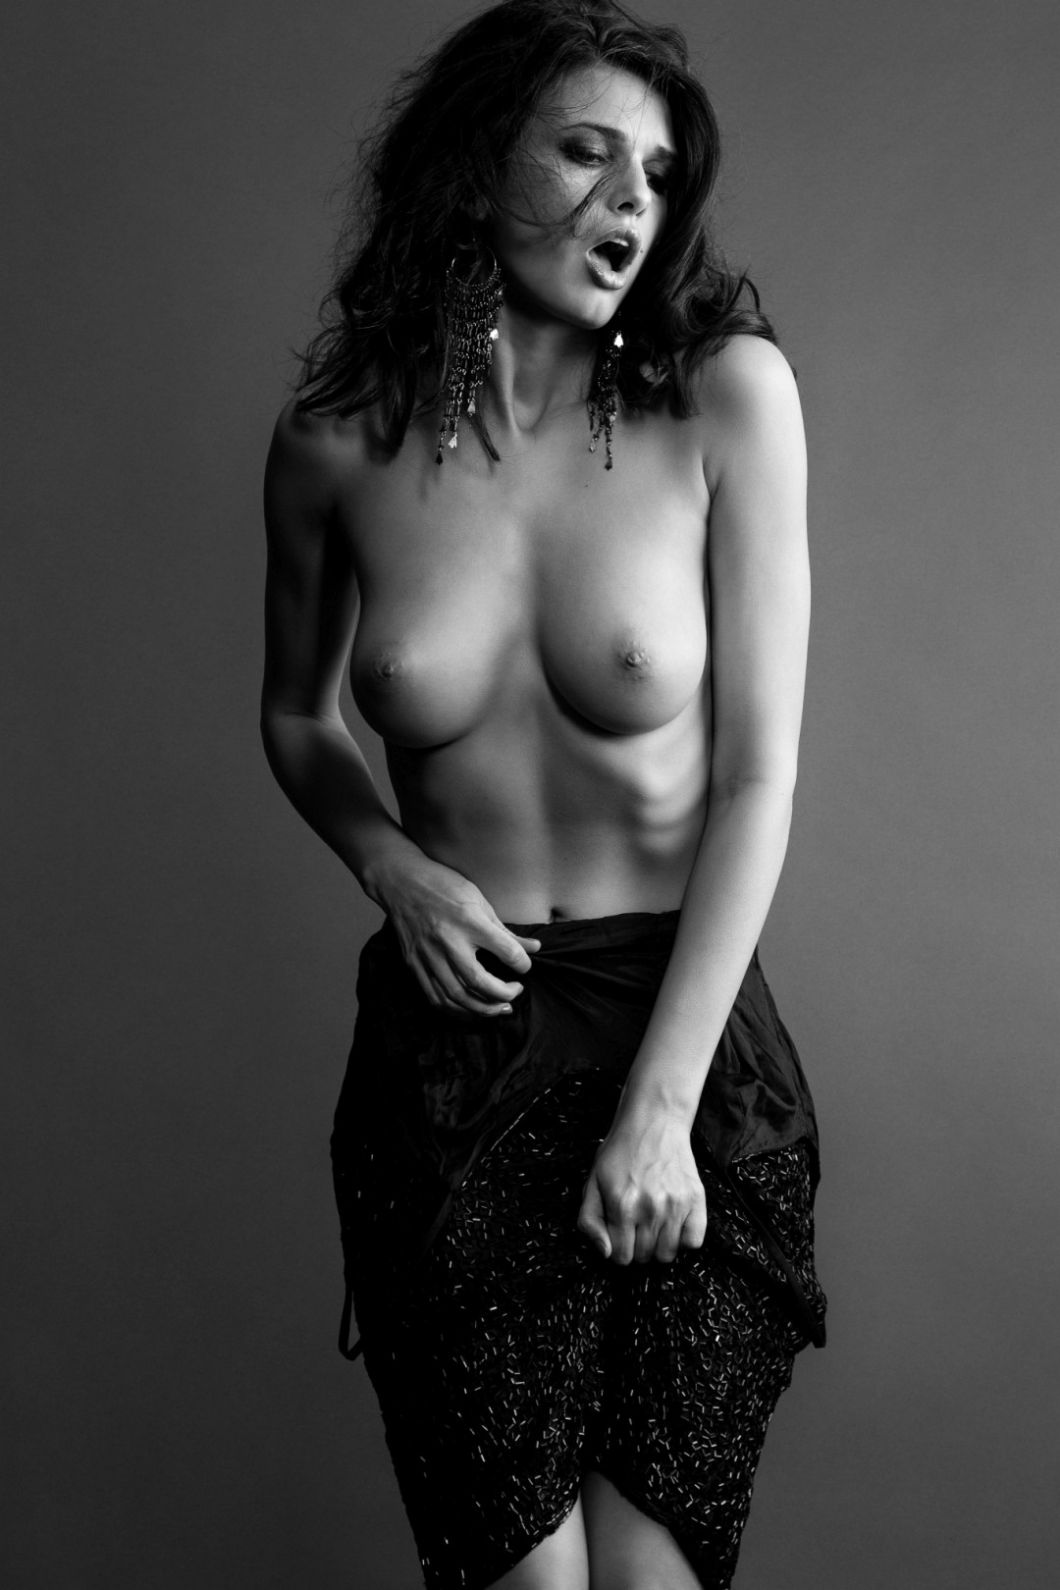 Zoi Gorman for COLE Magazine | STEFANO BRUNESCI: stefanobrunesci.com/zoi-gorman-for-cole-magazine